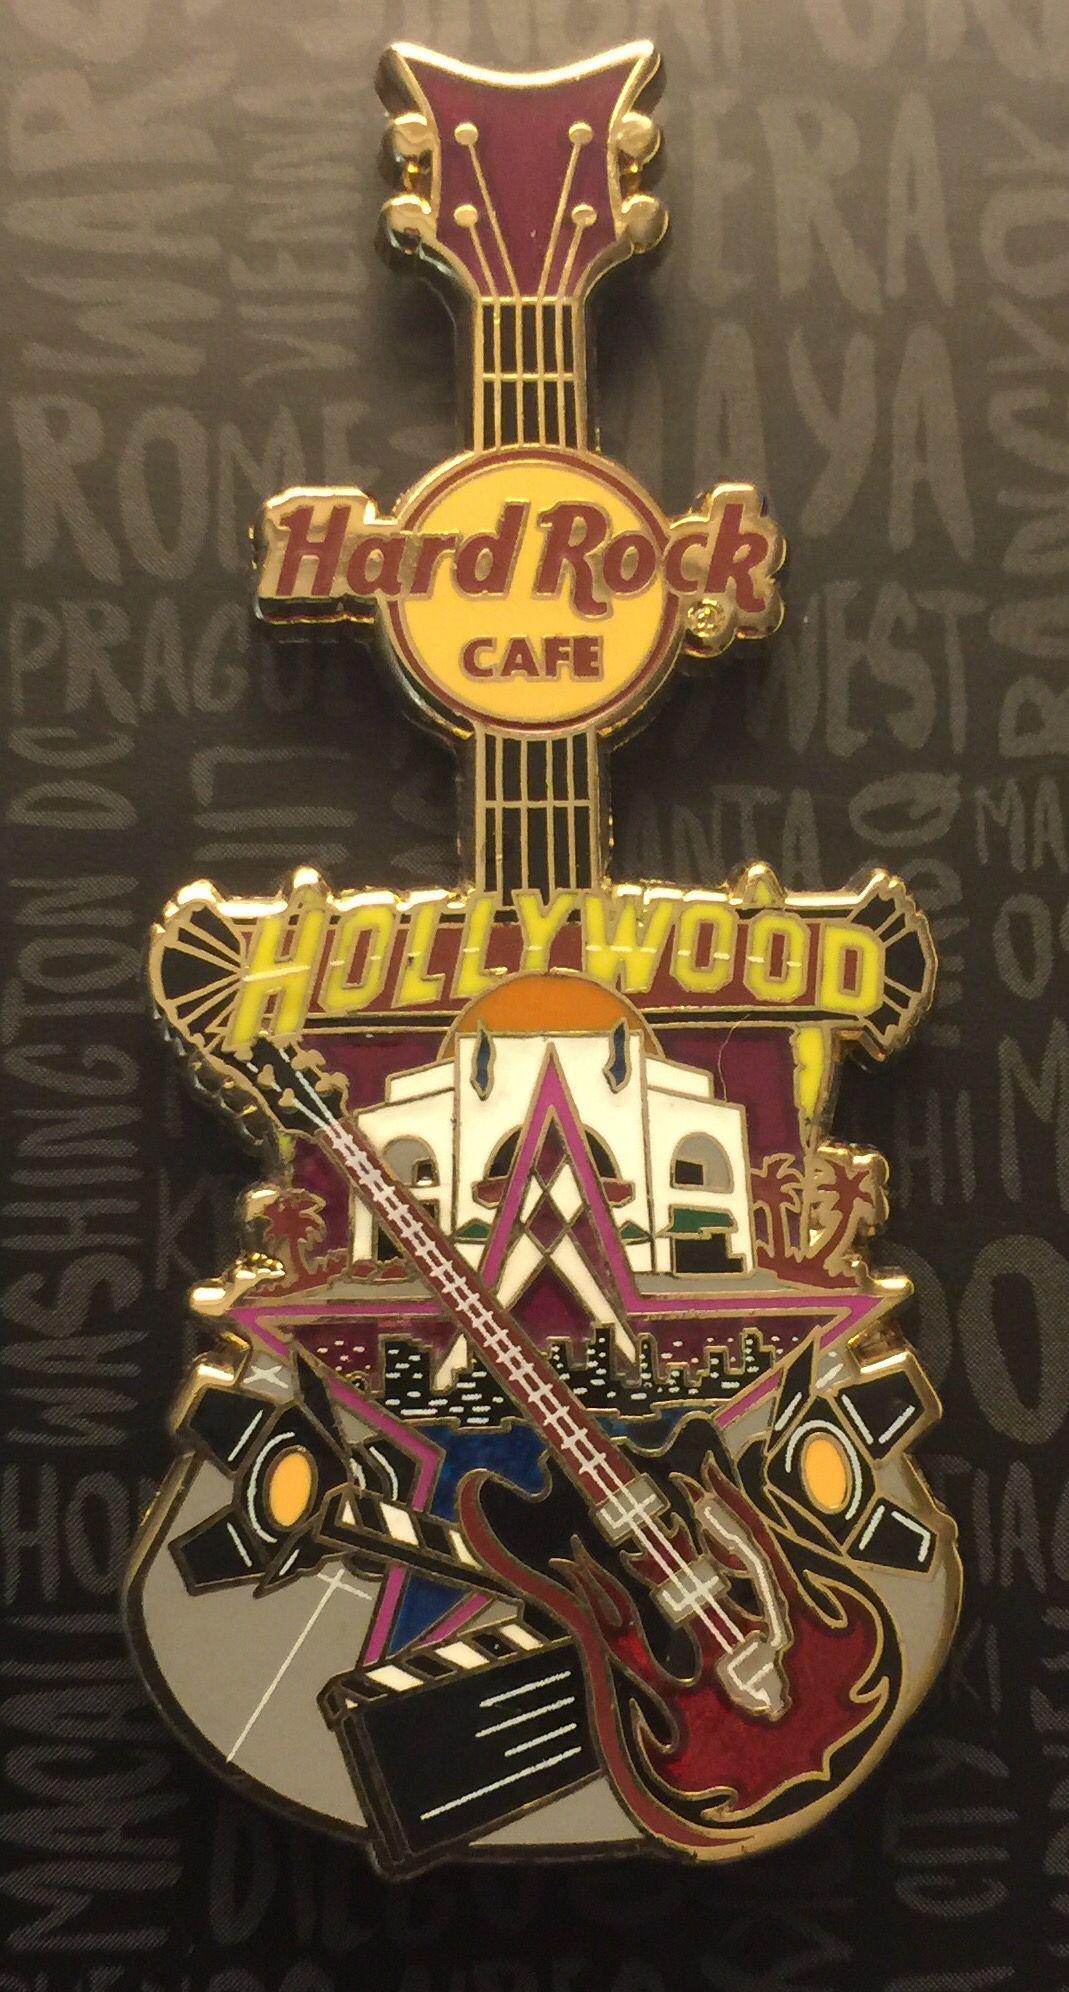 Restaurants near hard rock casino hollywood florida fl